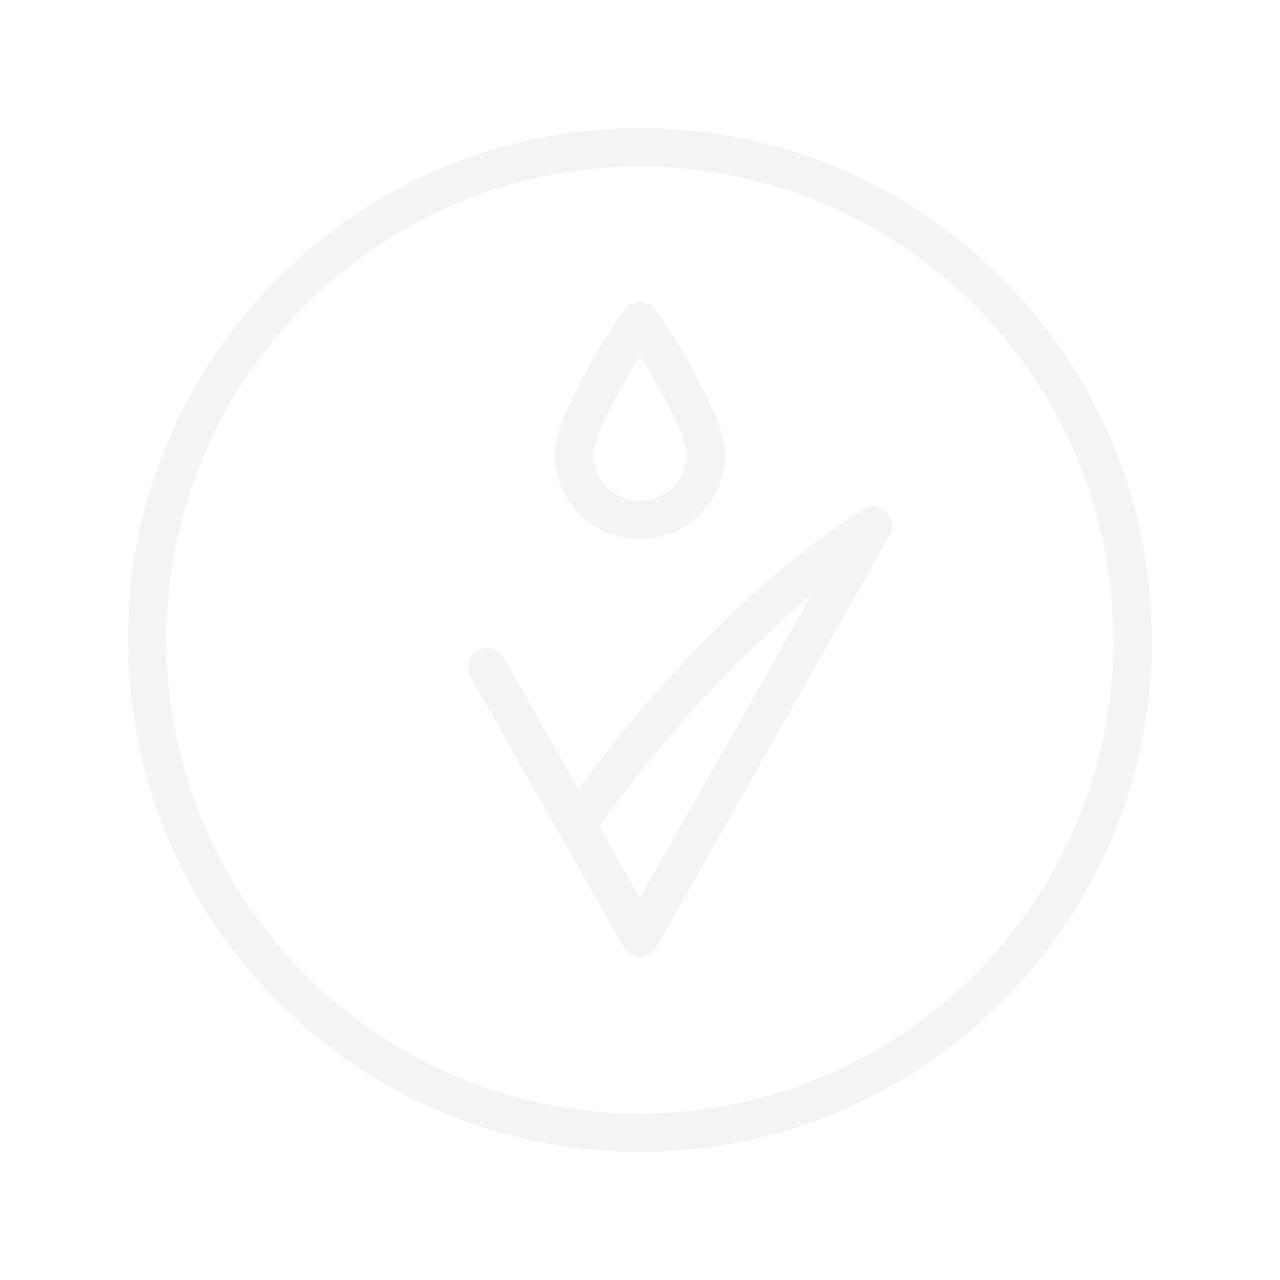 THE SKIN HOUSE APII Neck Cream крем для области шеи и декольте антивозрастной 50ml